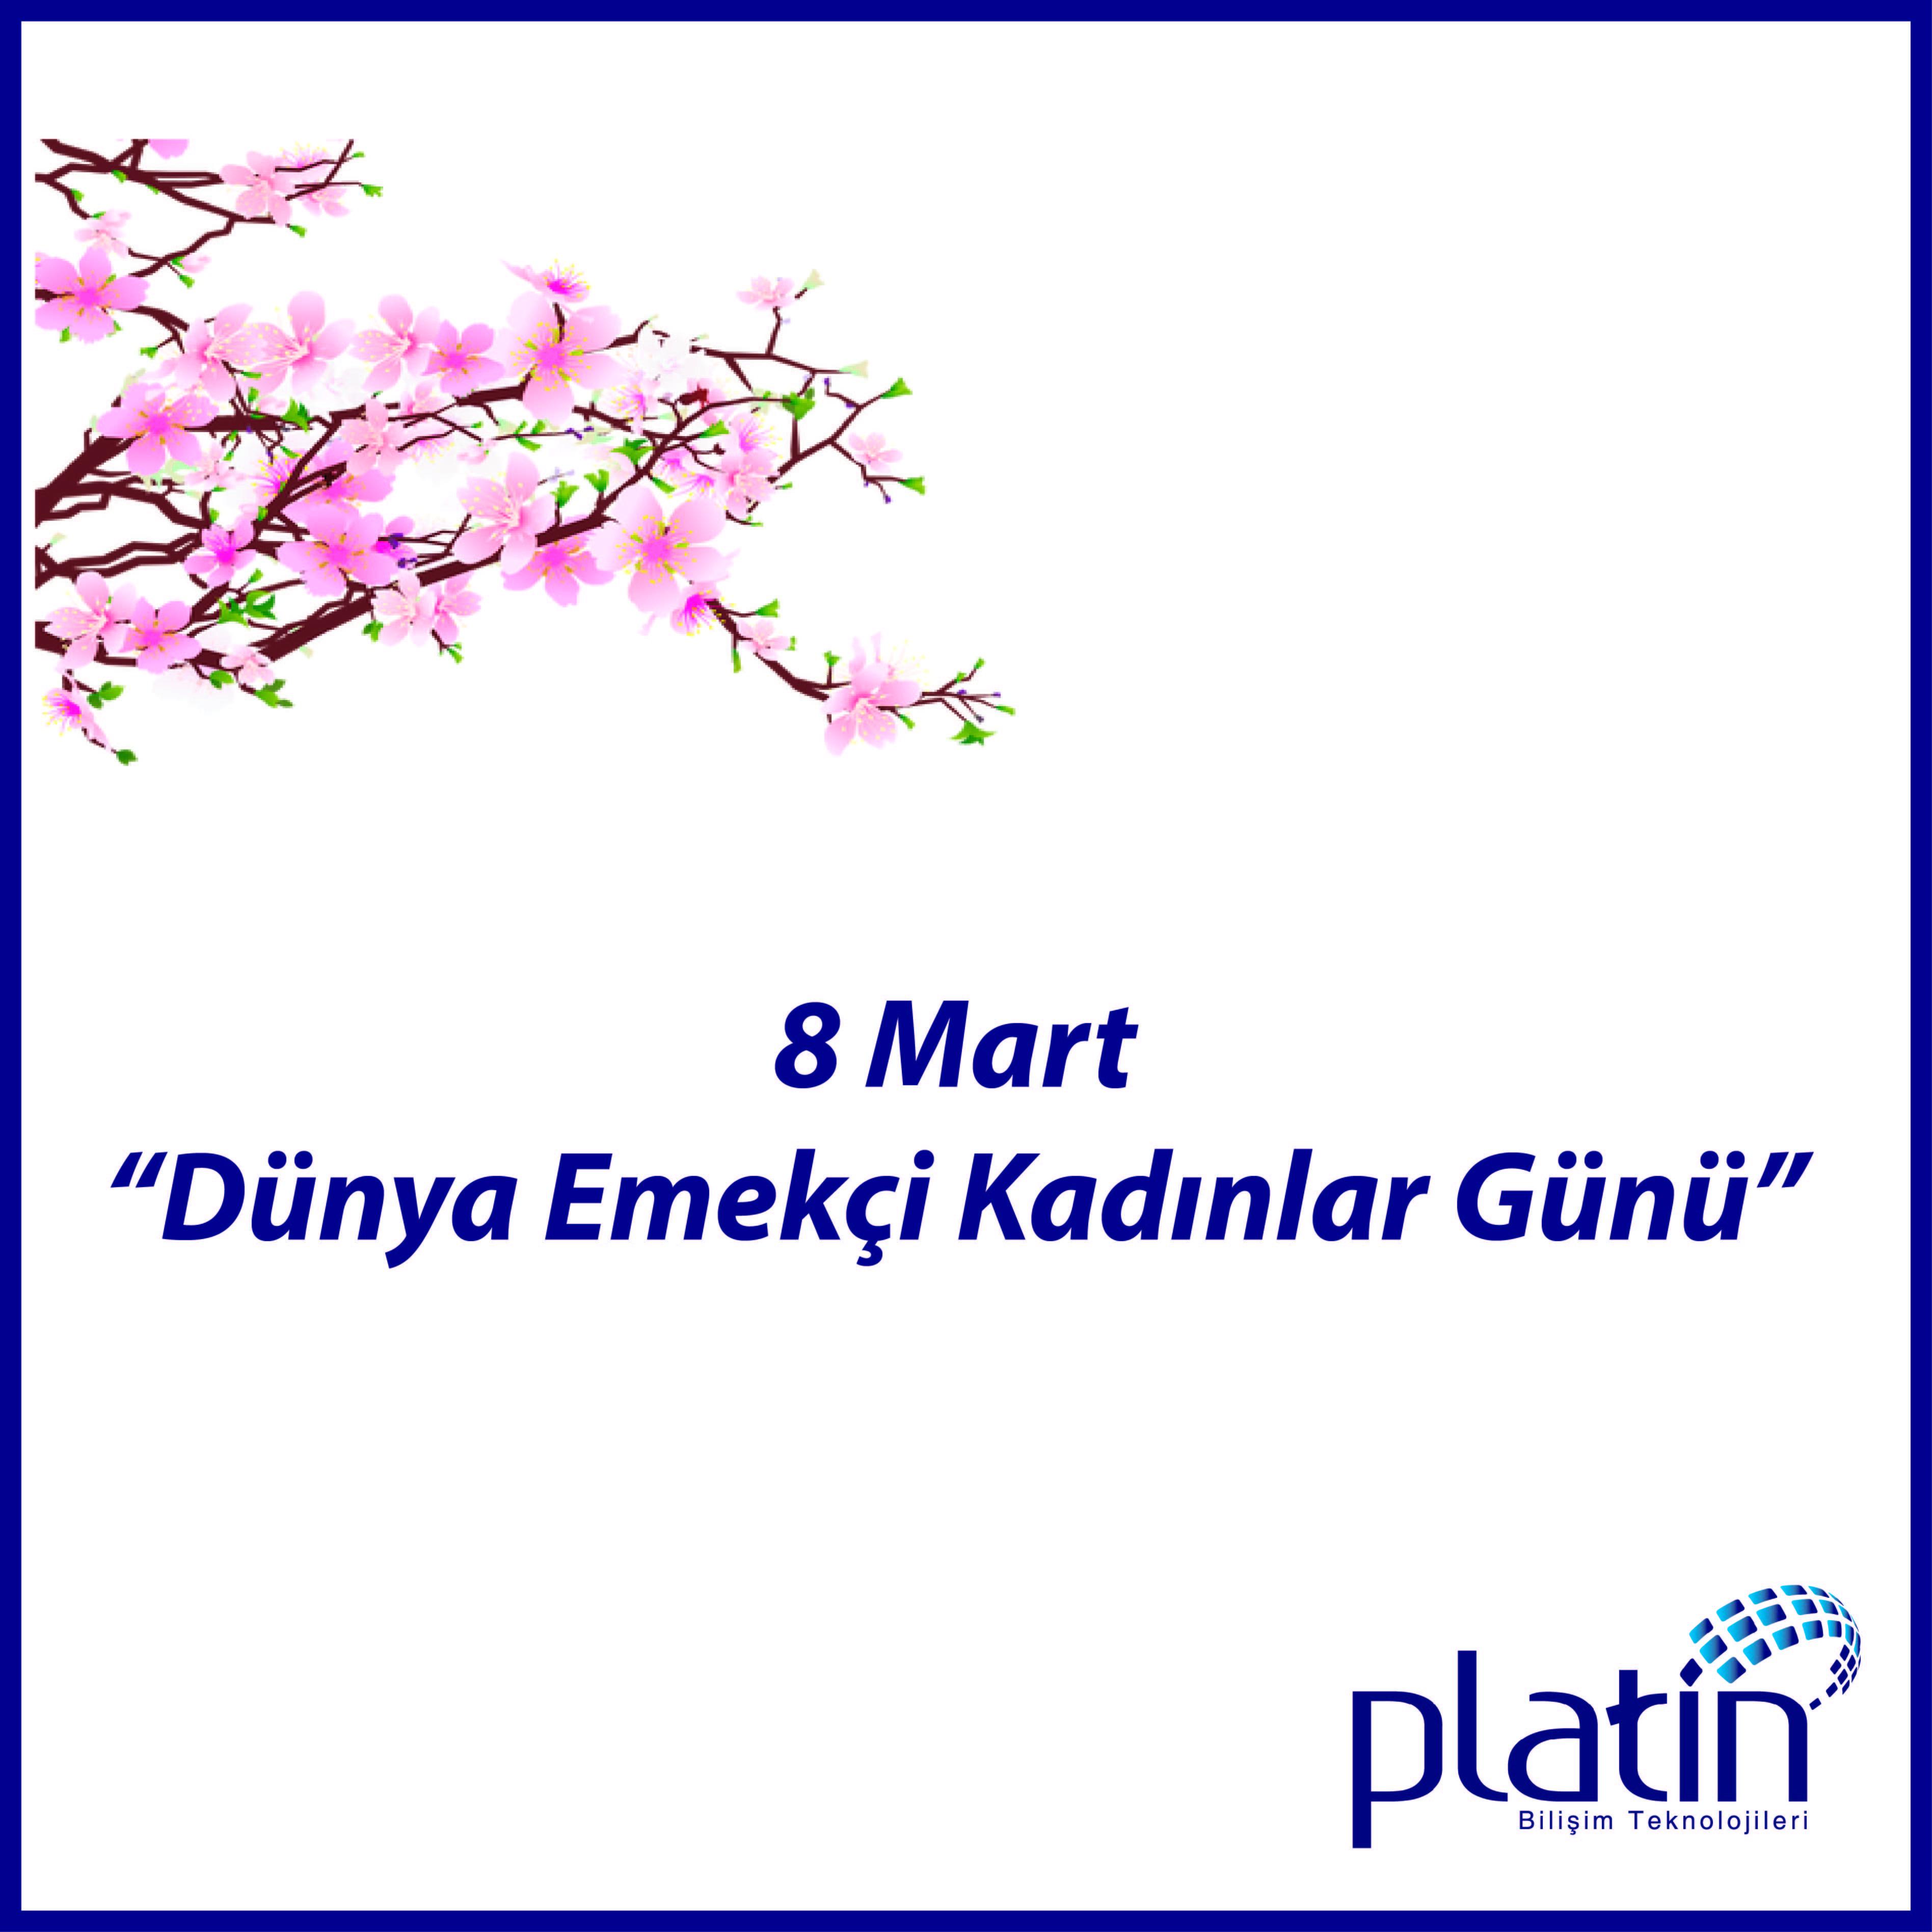 Platin Bilişim 8 Mart'ı kutladı:  https://www.facebook.com/pg/platinbilisimtr/photos/?tab=album&album_id=1468692646475152